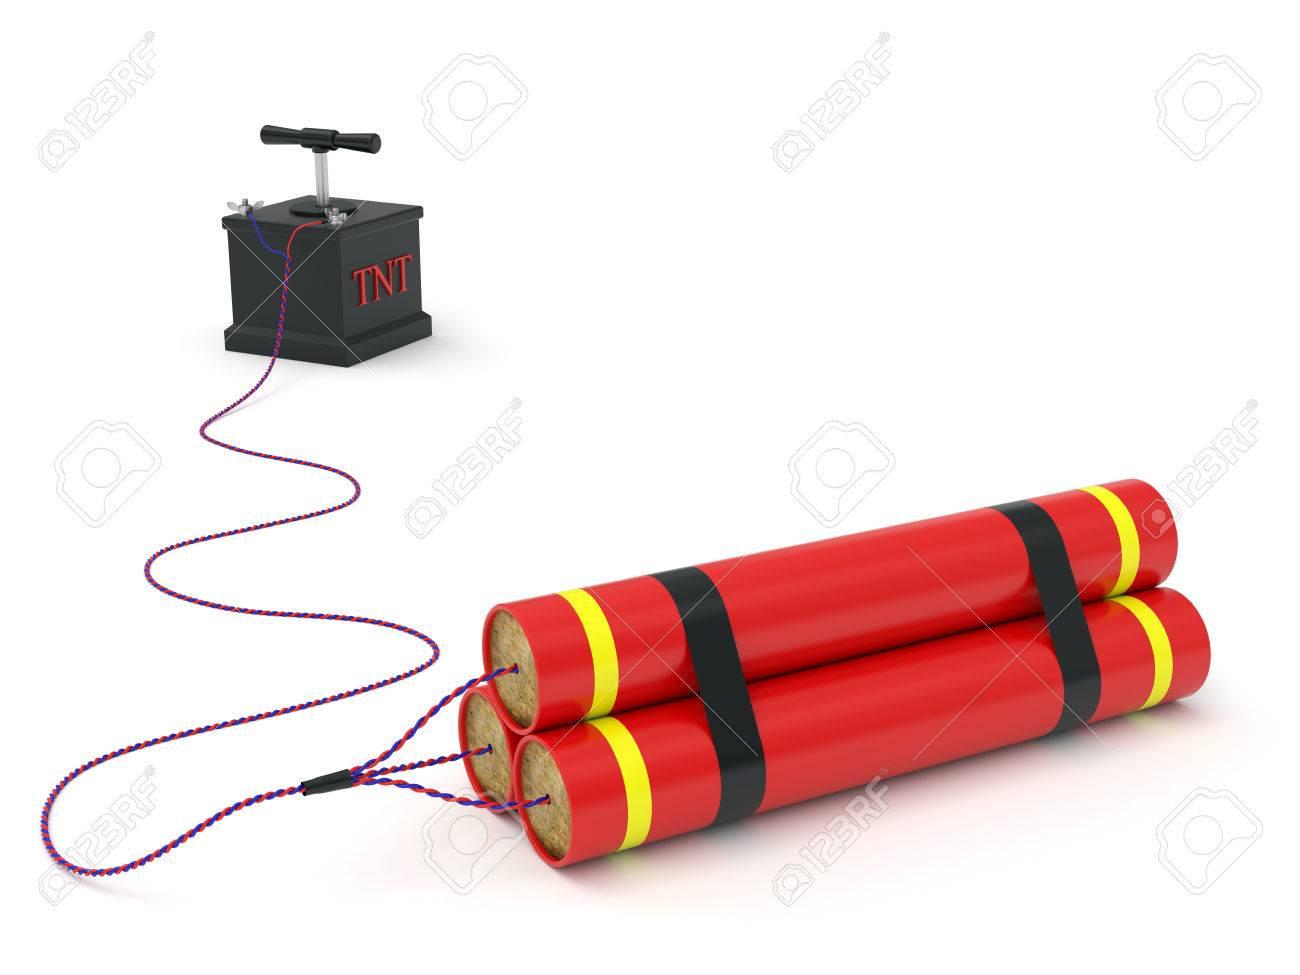 hight resolution of dynamite fuse box schema wiring diagram dynamite cartoon dynamite fuse box data wiring diagram site dynamite